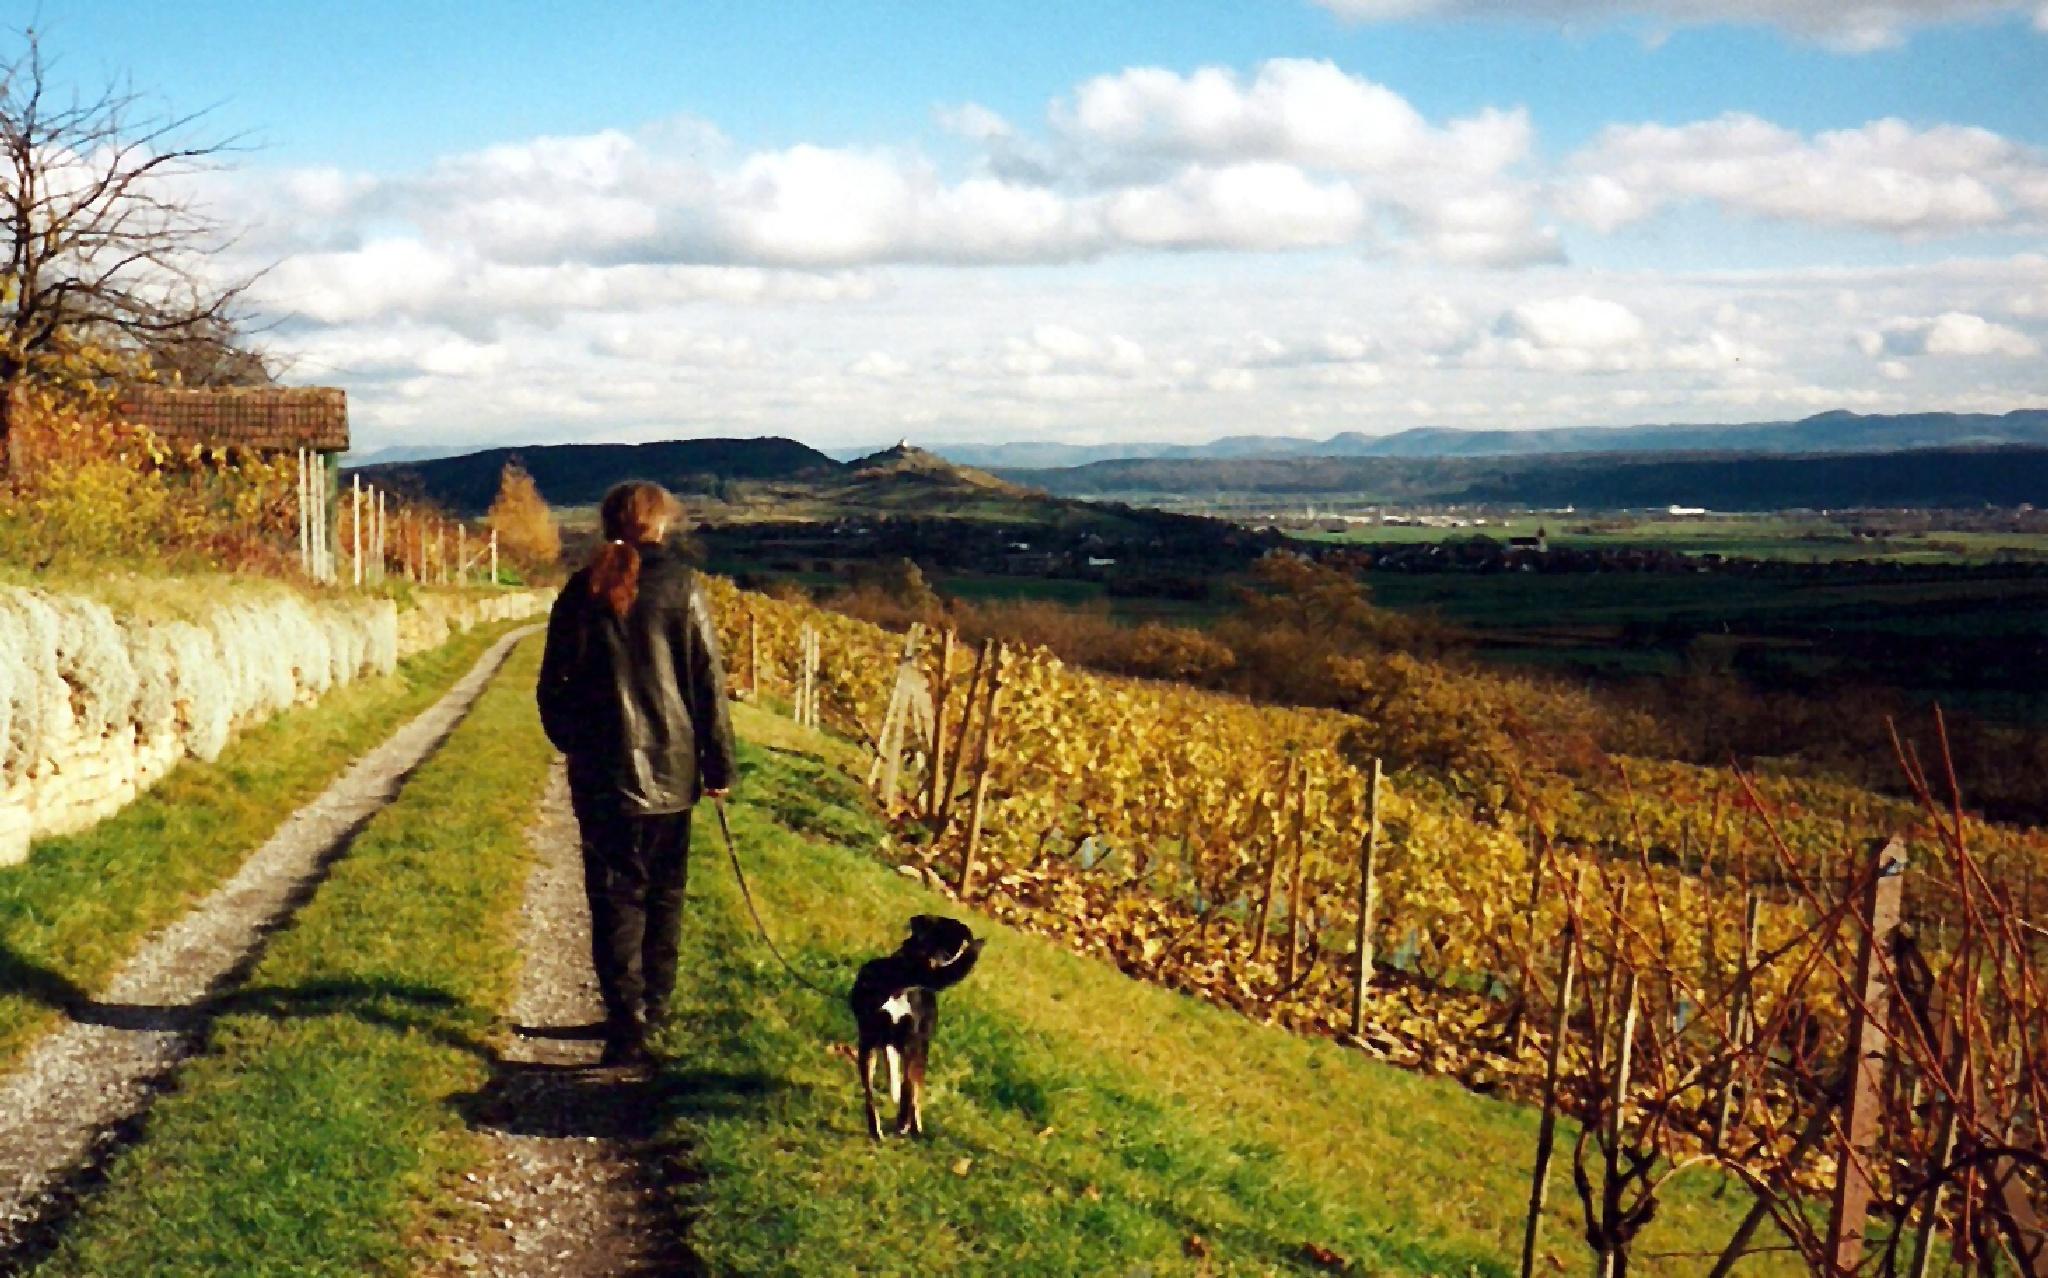 Walk in the Grapehill by astarot